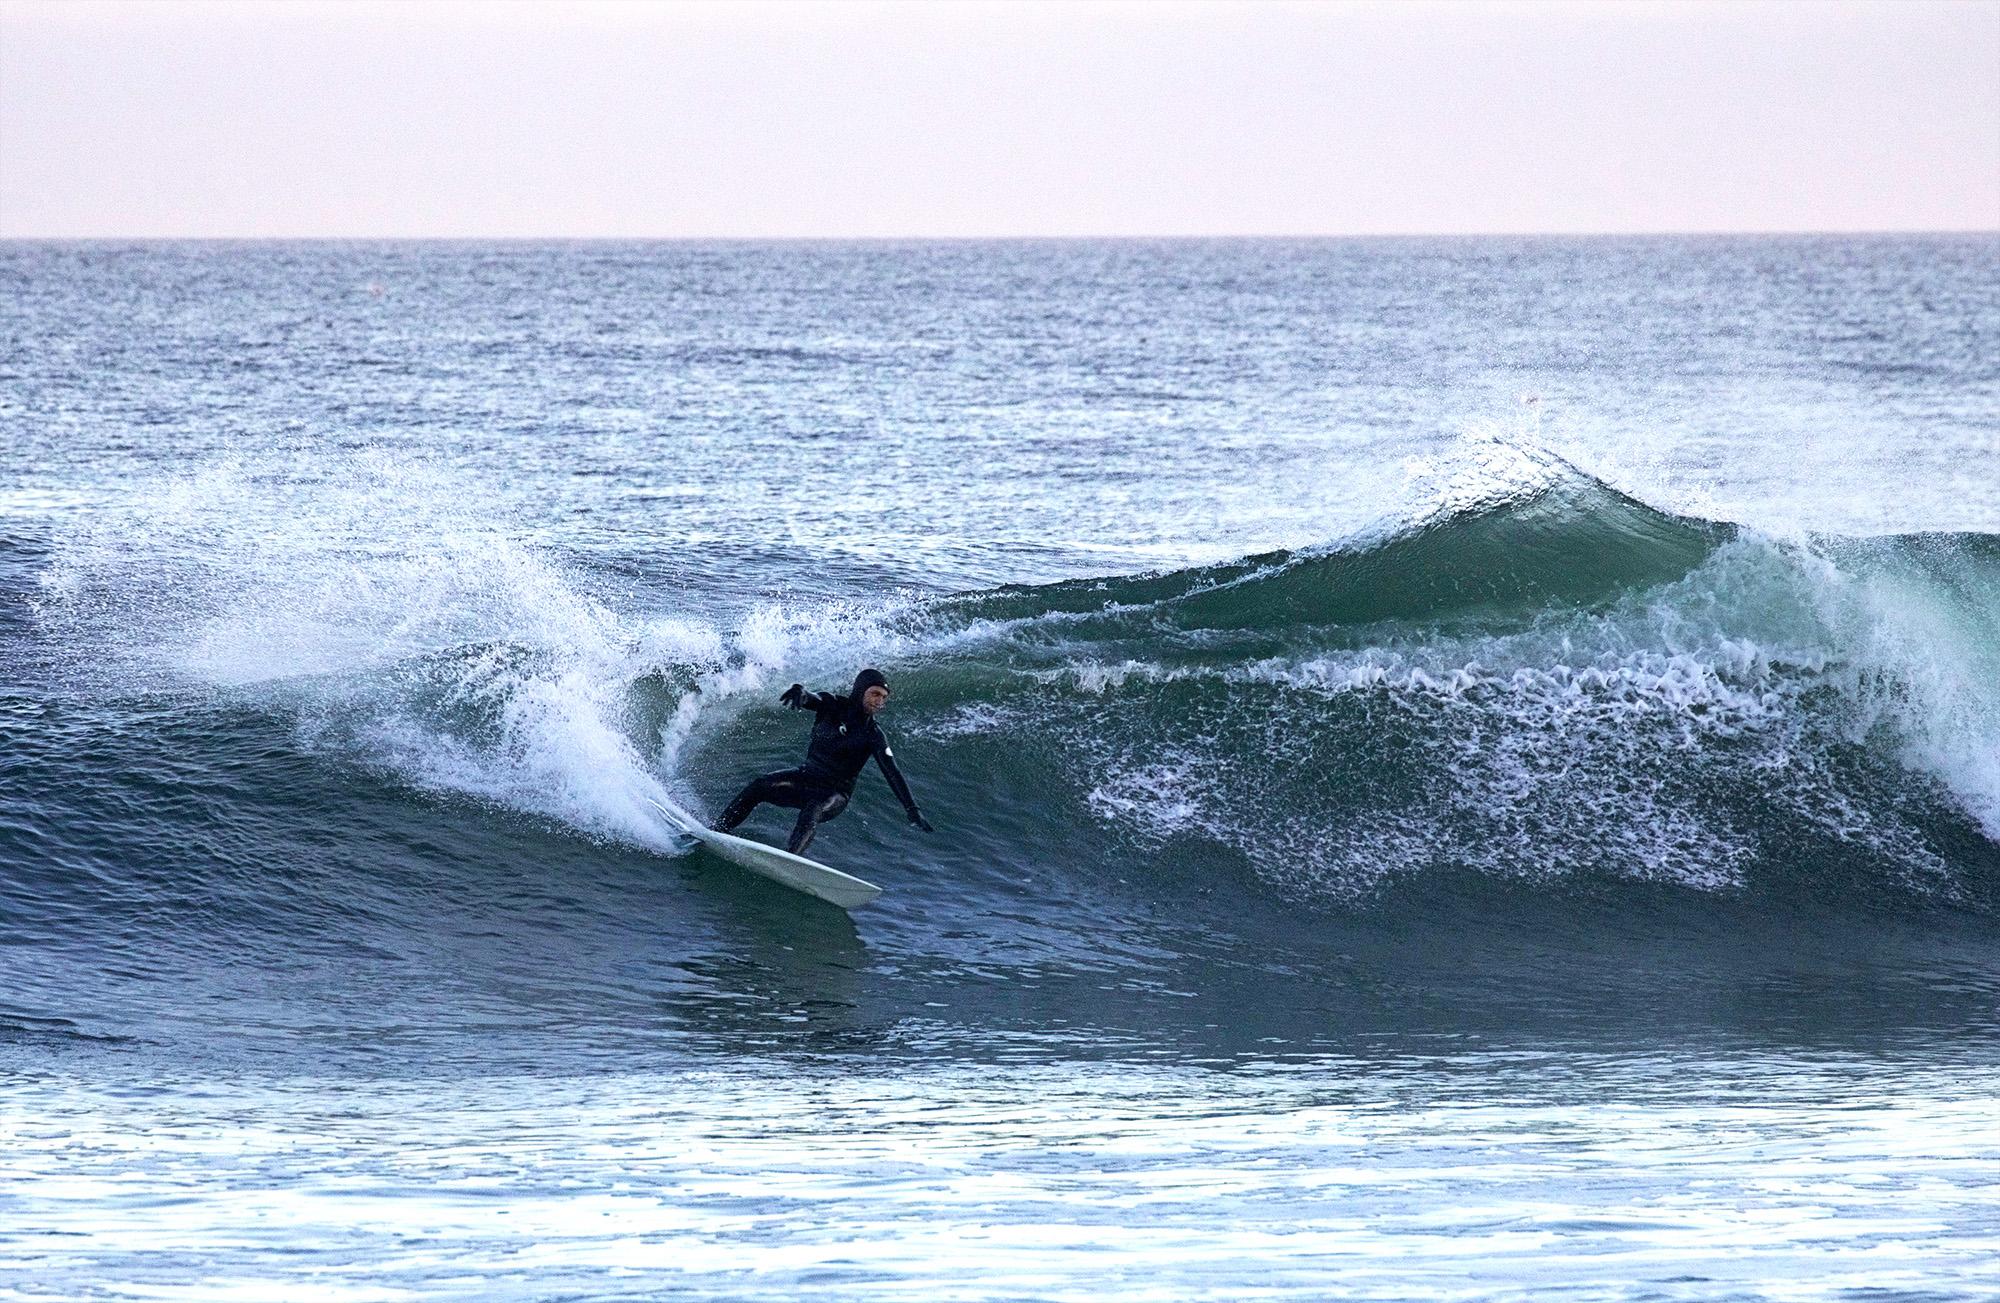 1-19-17 MTK Surfer 2.jpg